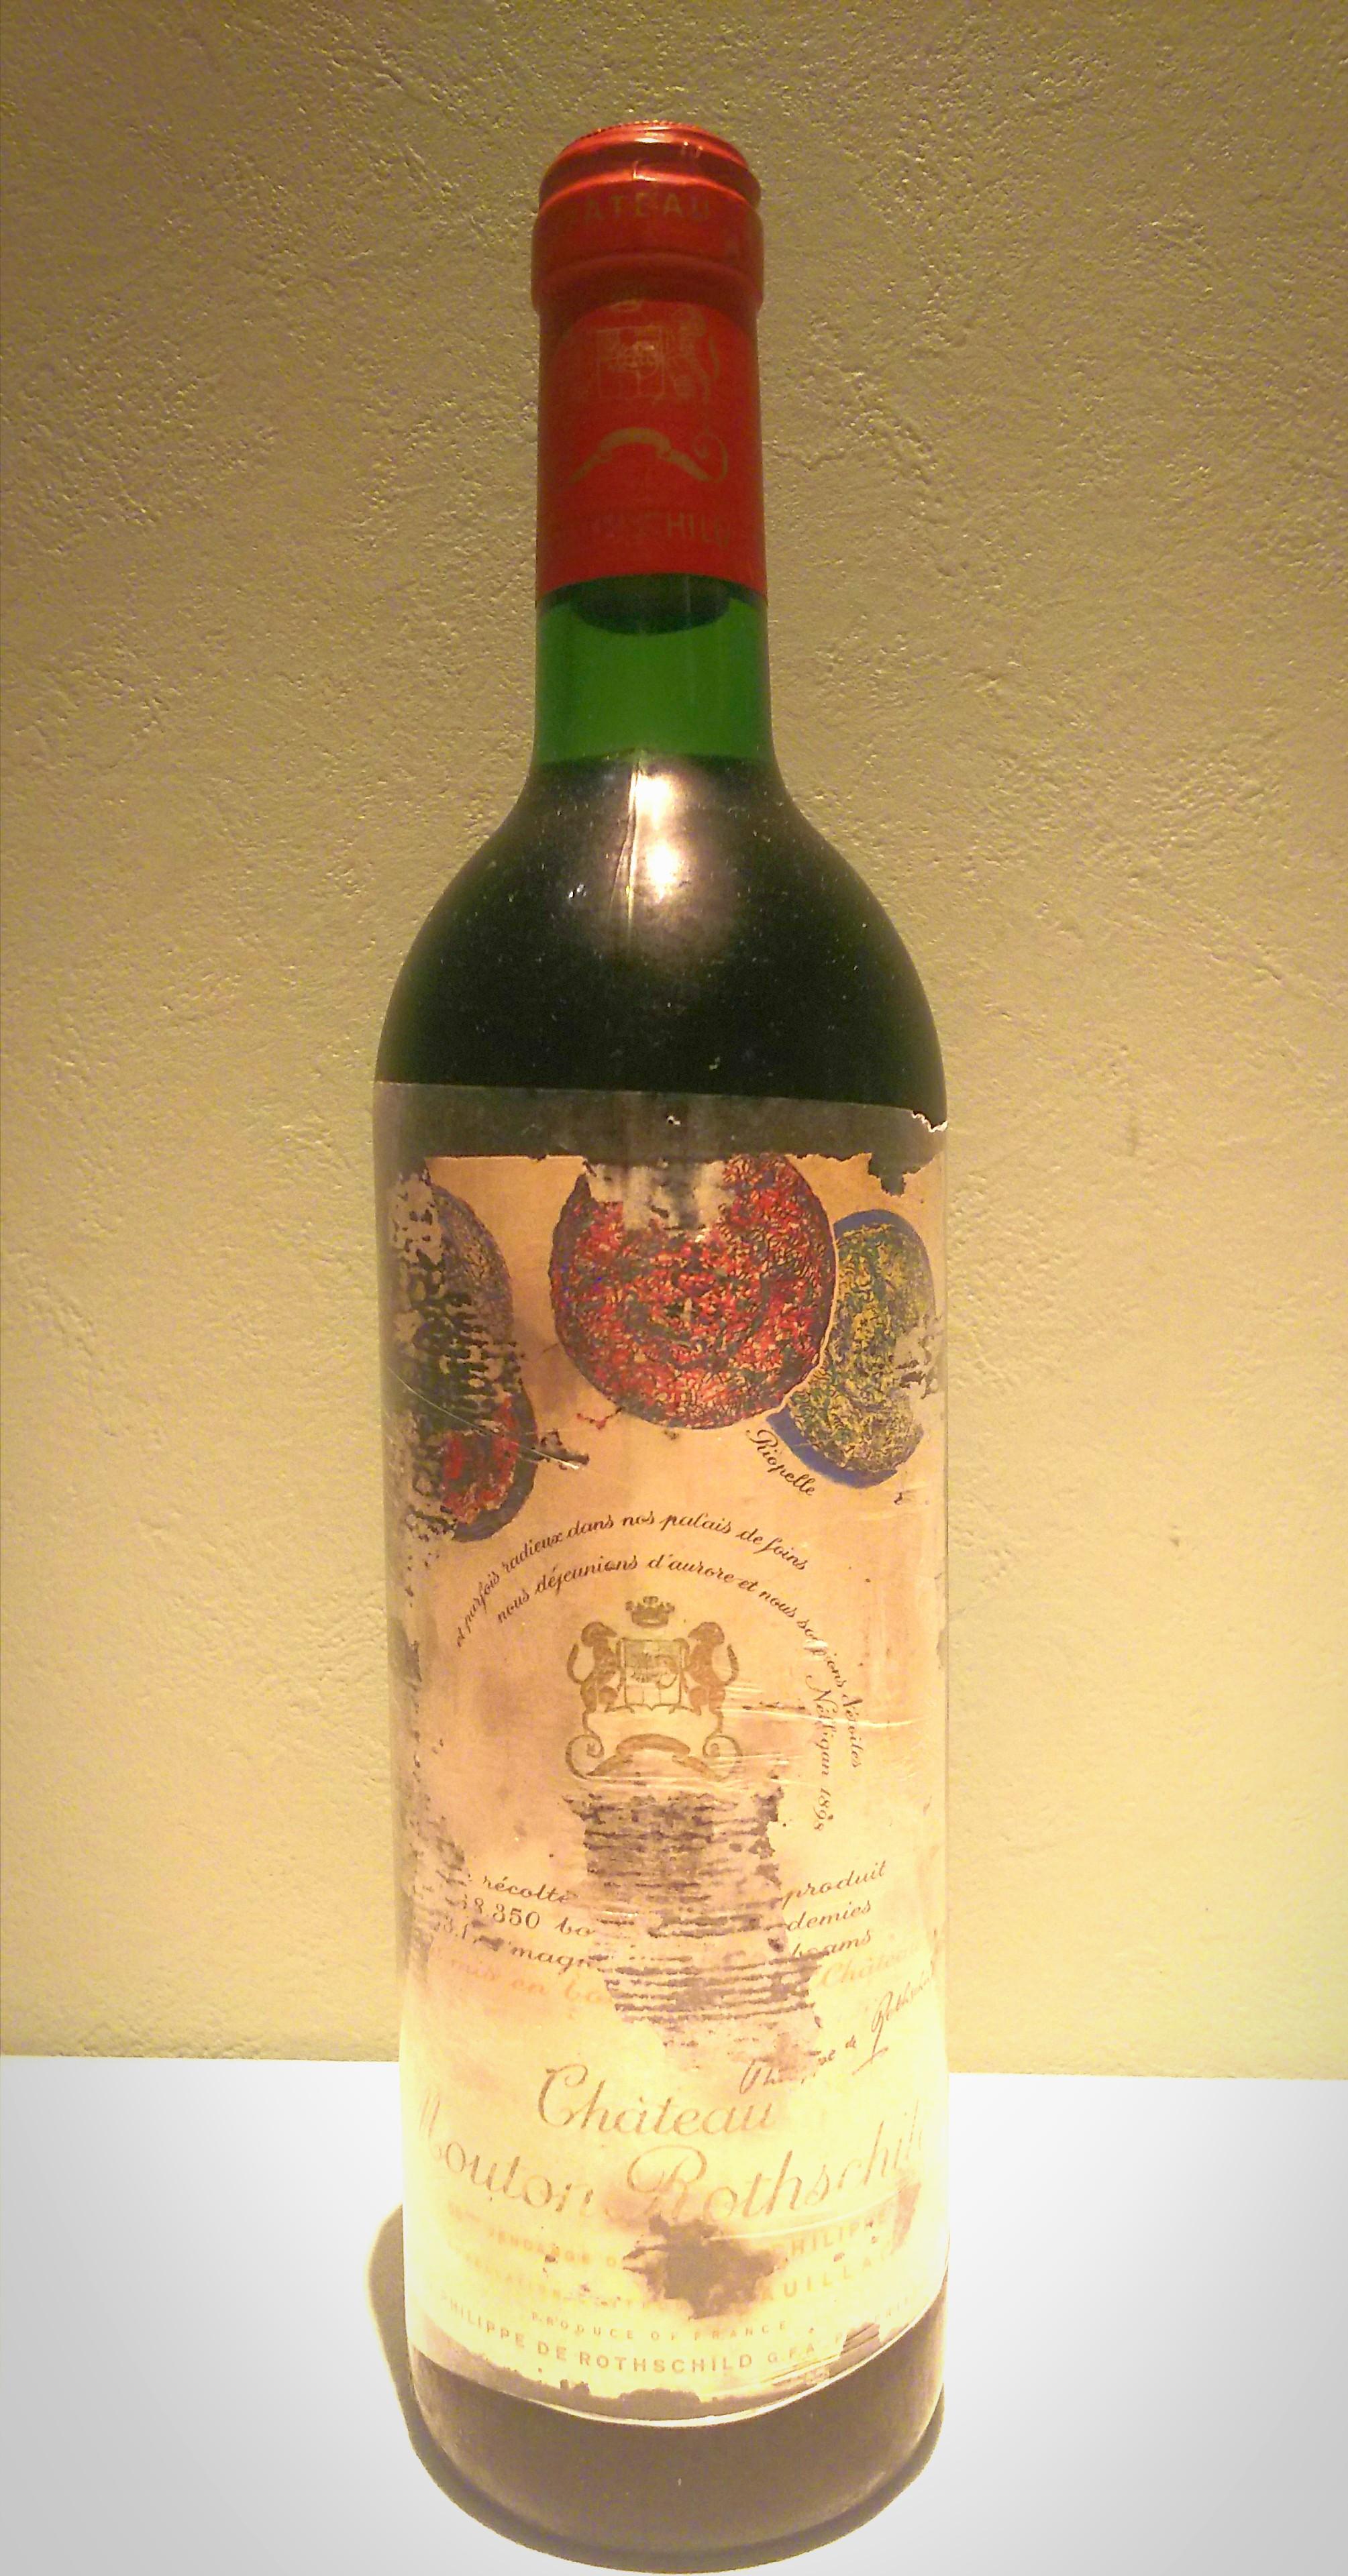 http://encens.silk.to/winelist/uplaod/1978Mputon.jpg